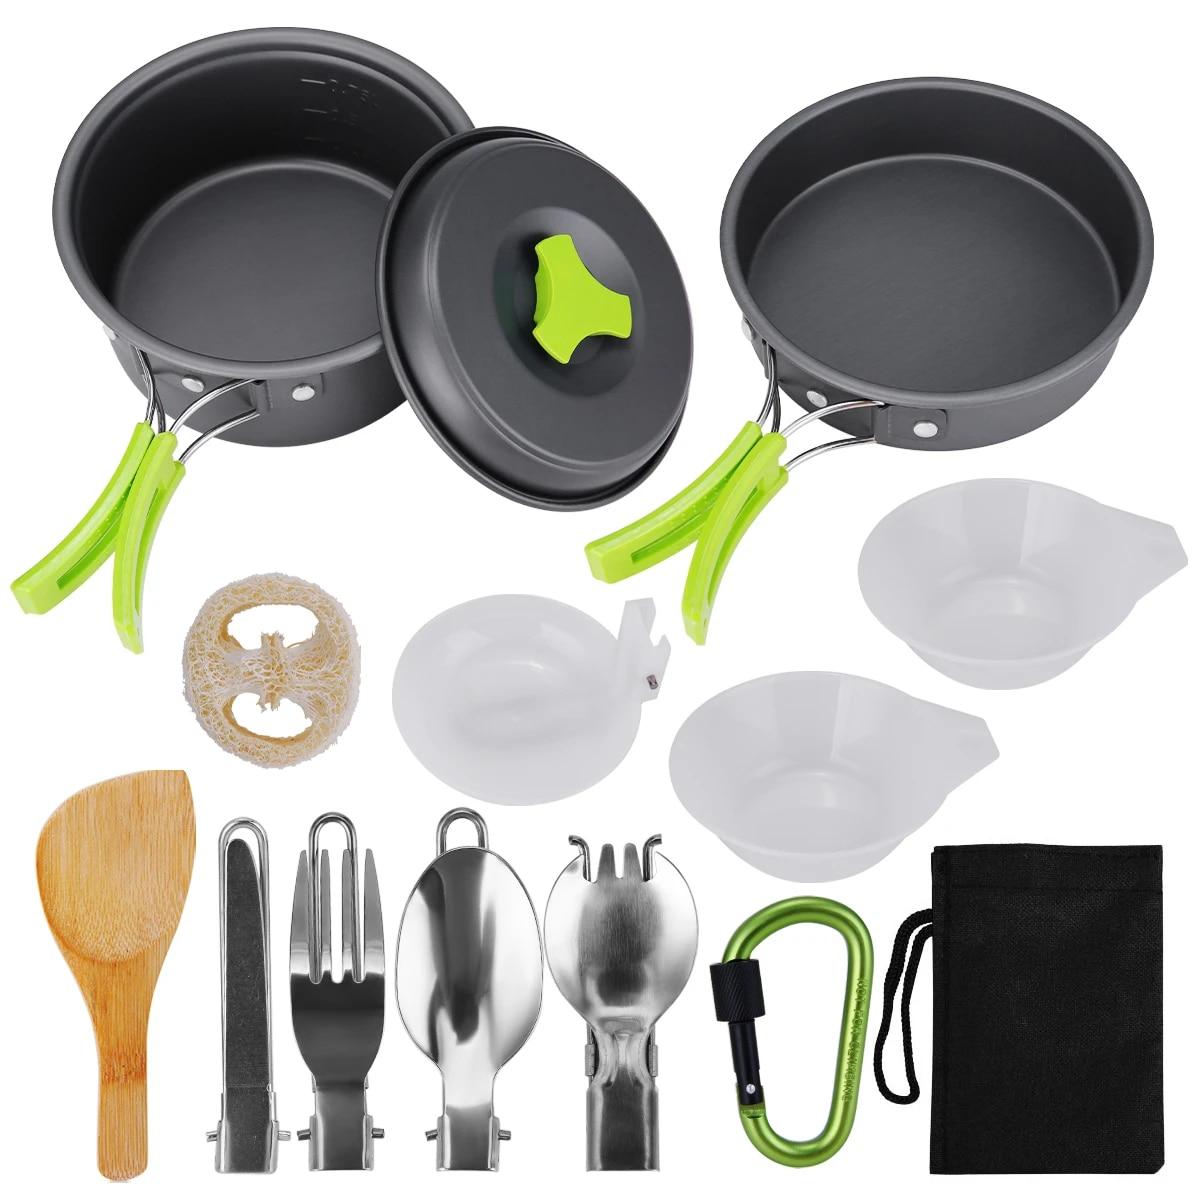 8-12Pcs Outdoor Camping Hiking Cookware Backpack Cooking Picnic Bowl Pot Pan Set